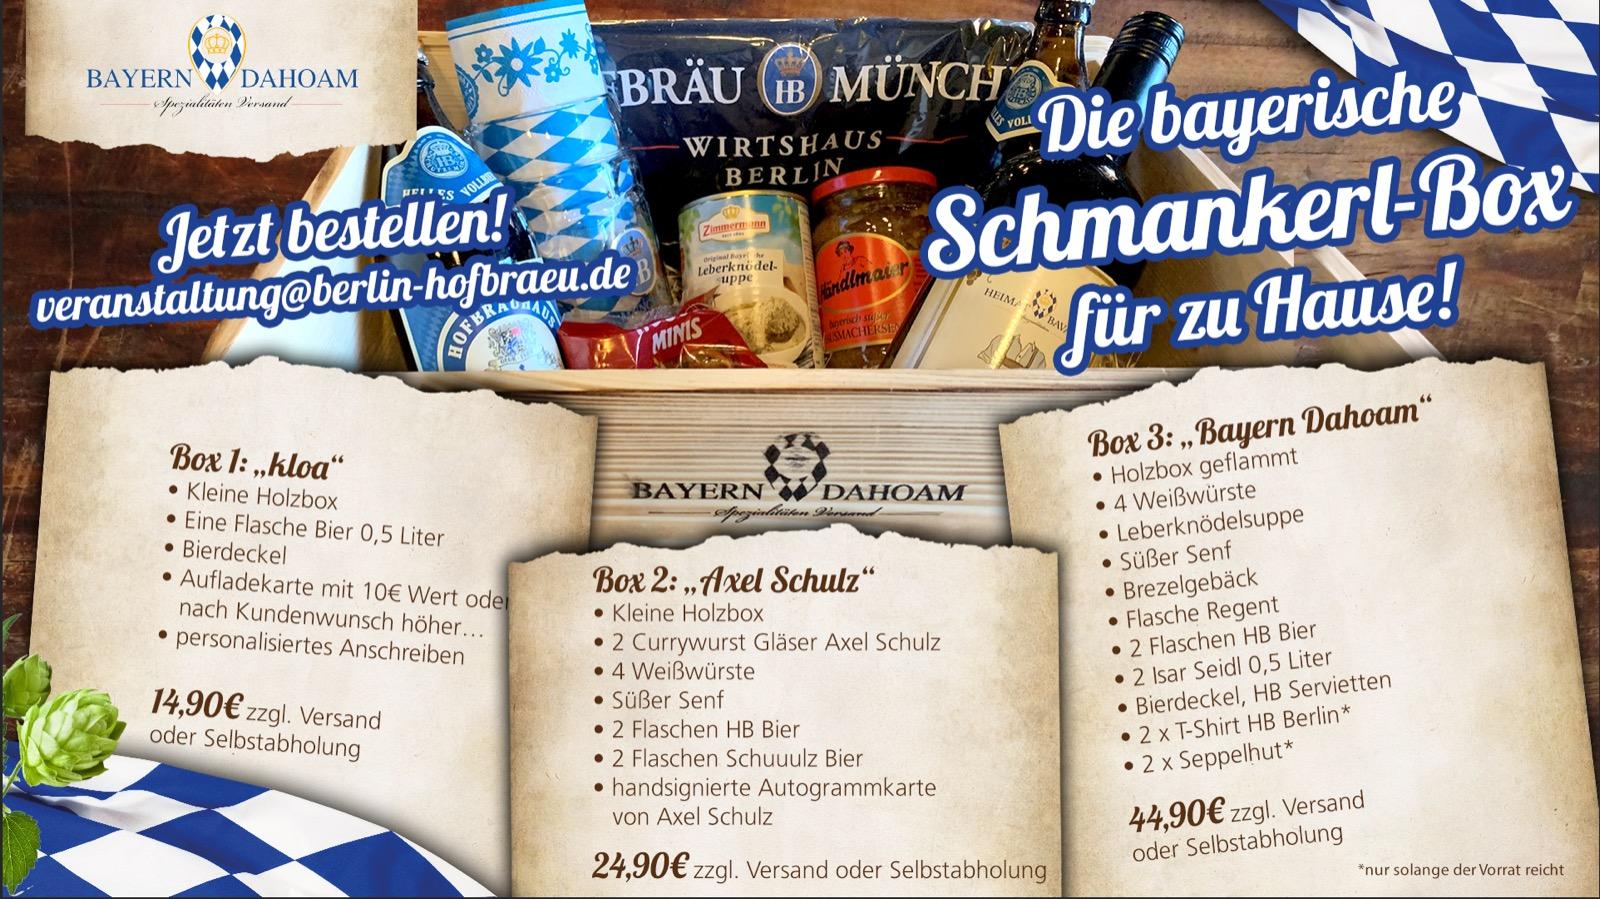 Bayern Dahoam delicacy box